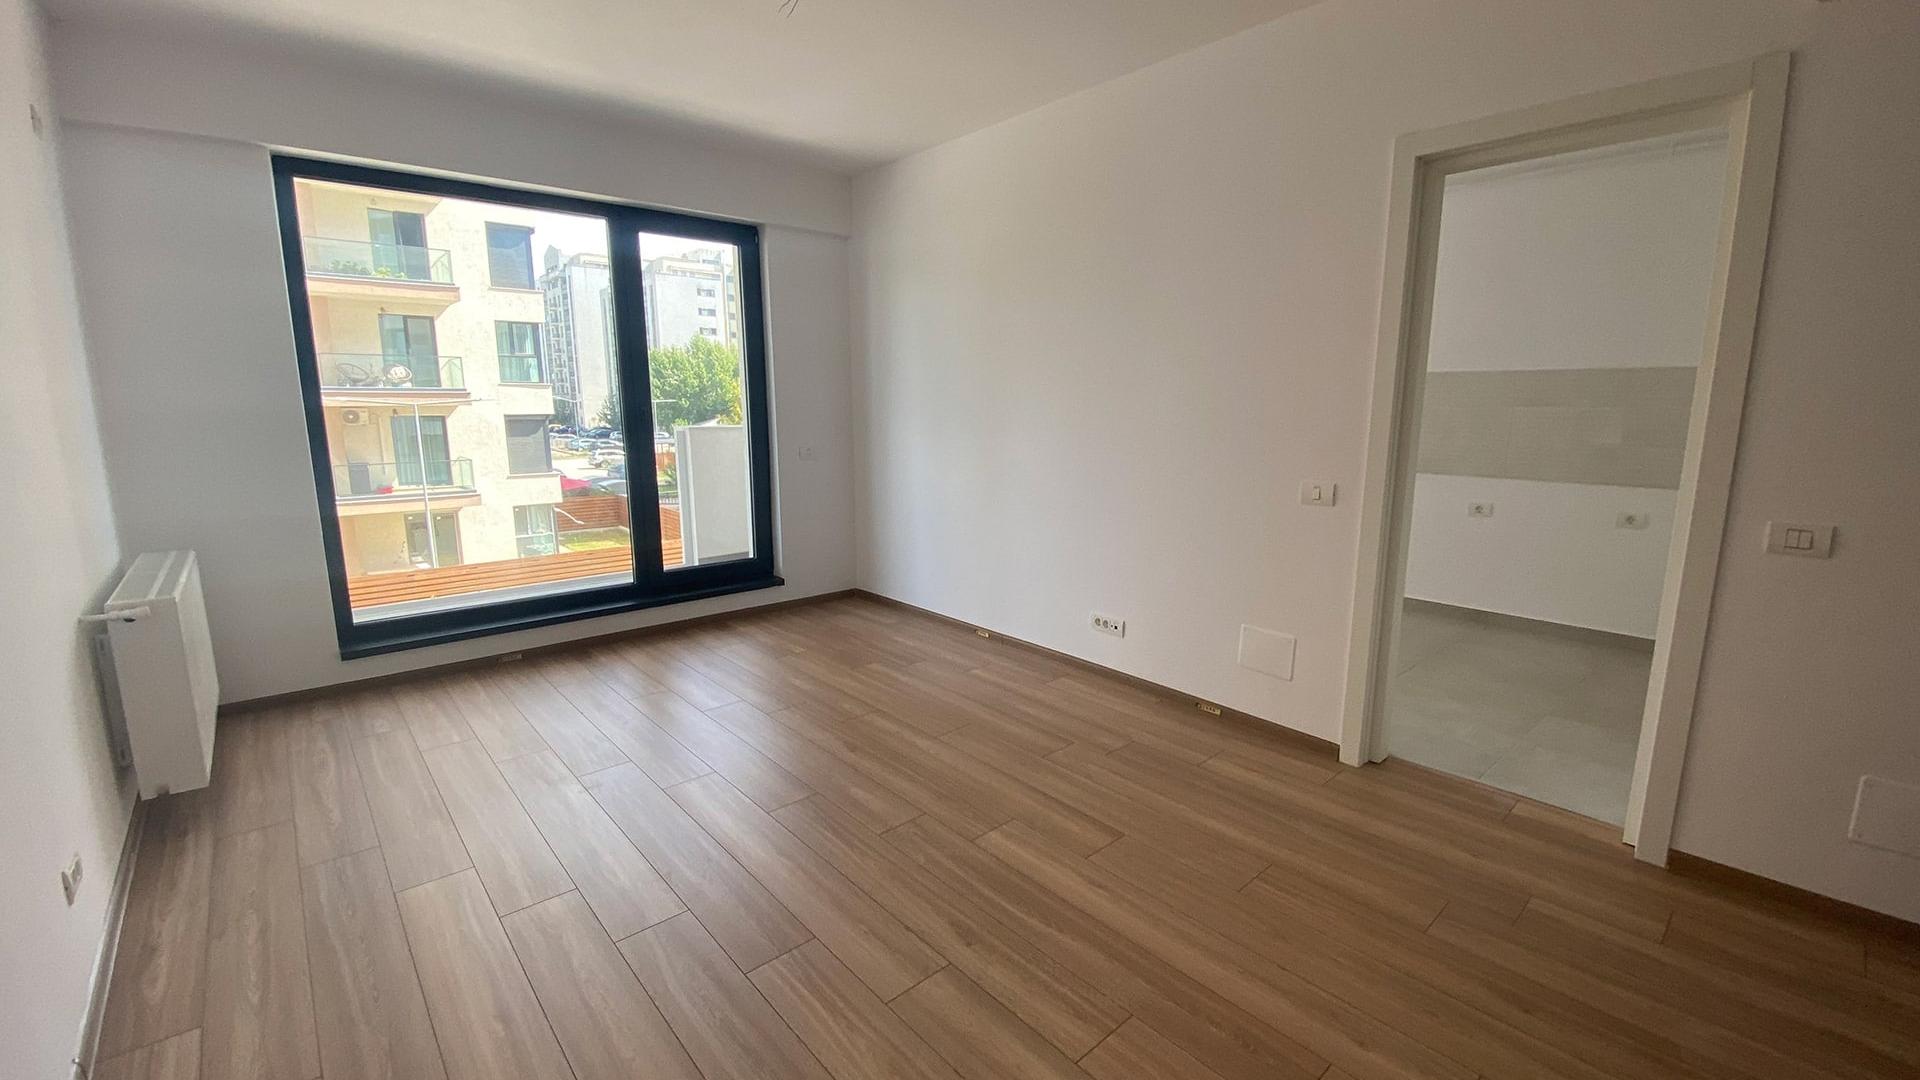 Stadiu executie Uverturii Residence 4 Septembrie 2020 - Apartamente si garsoniere de vanzare Militari, Gorjului - 2